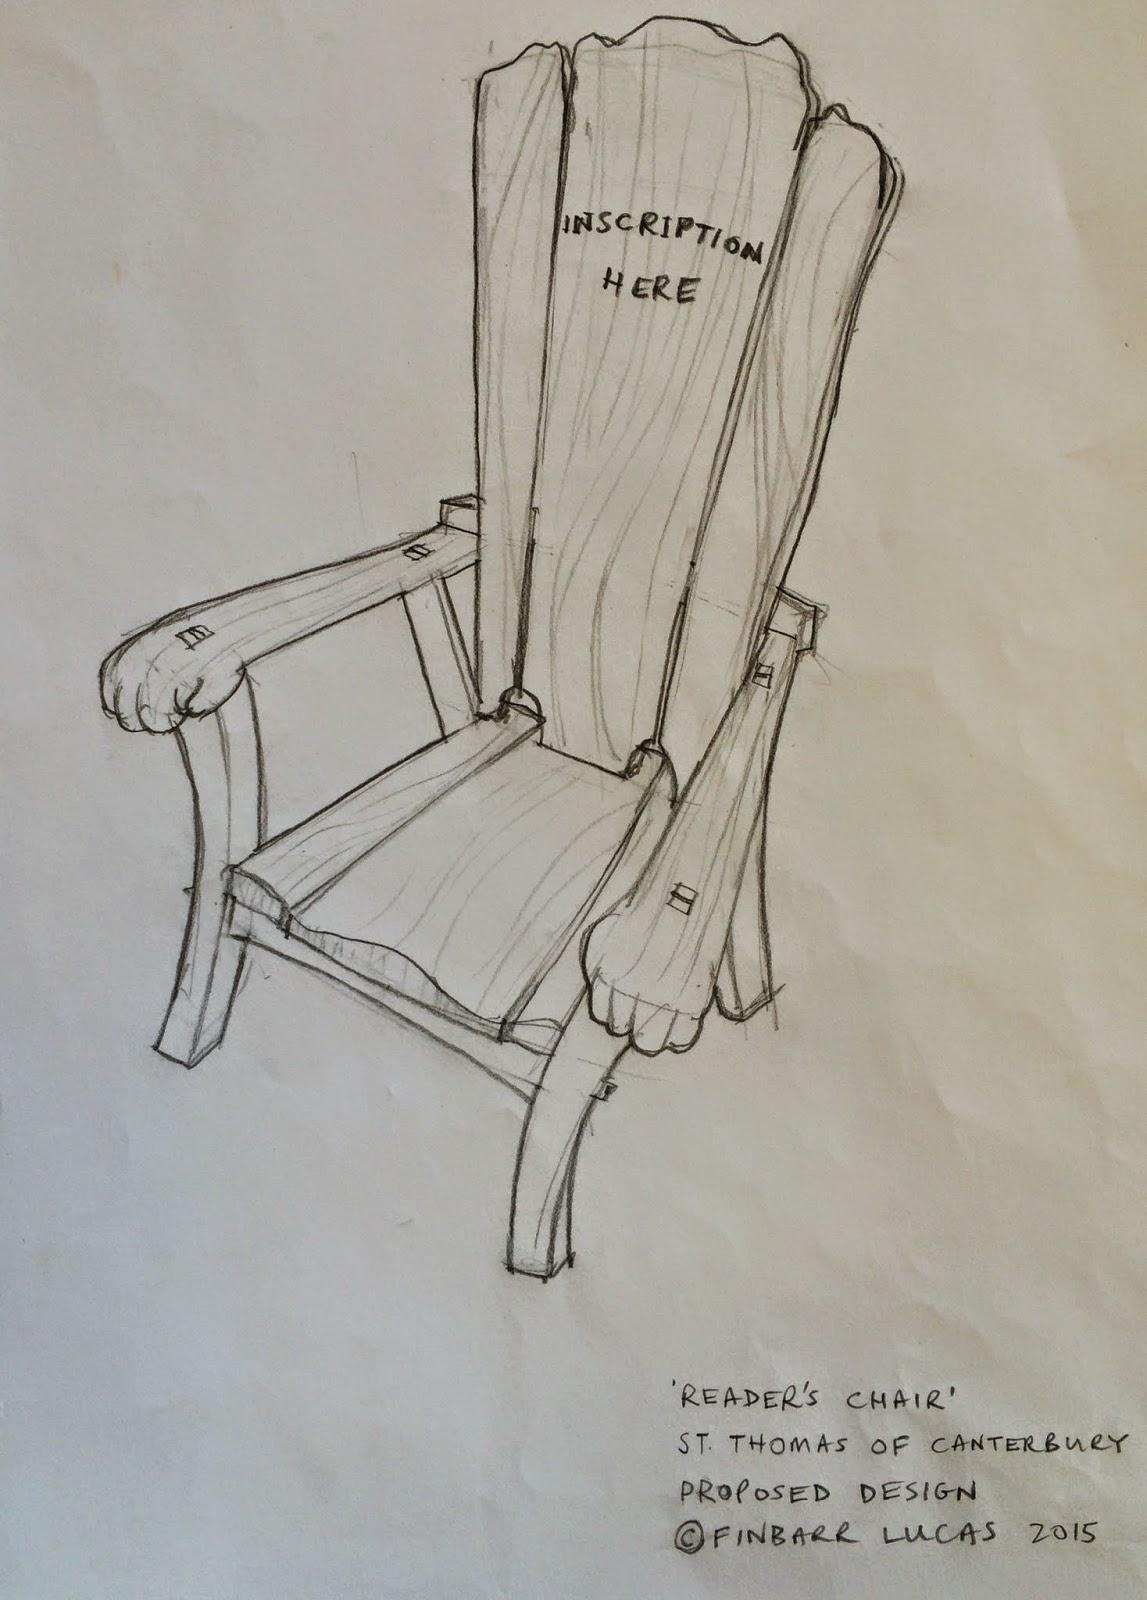 Reader's chair drawing.jpg